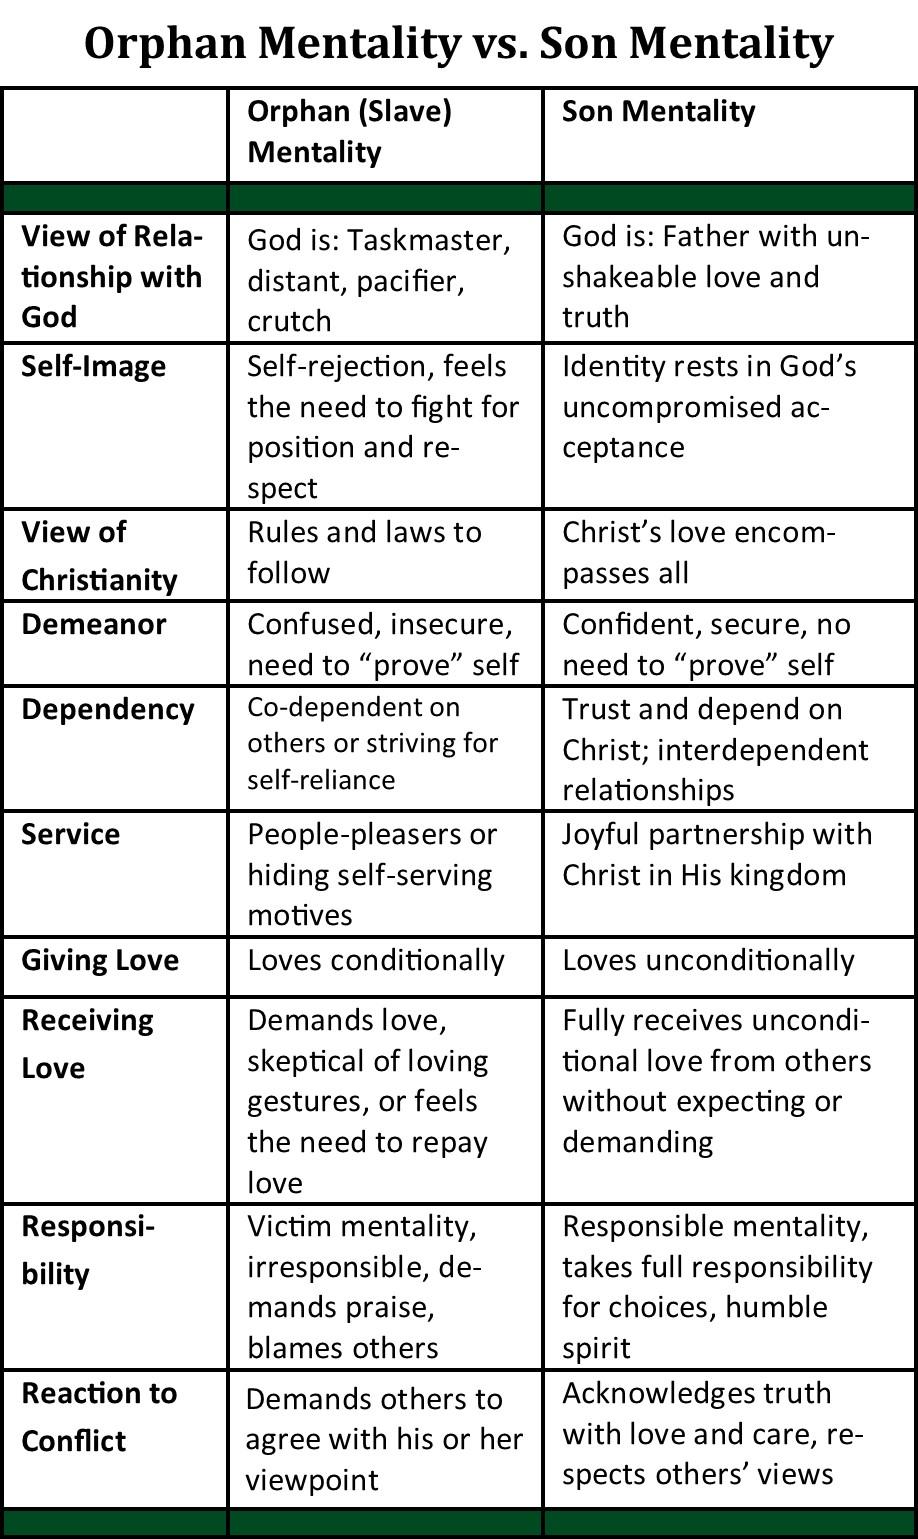 Orphan Mentality vs. Son Mentality (pg. 111)